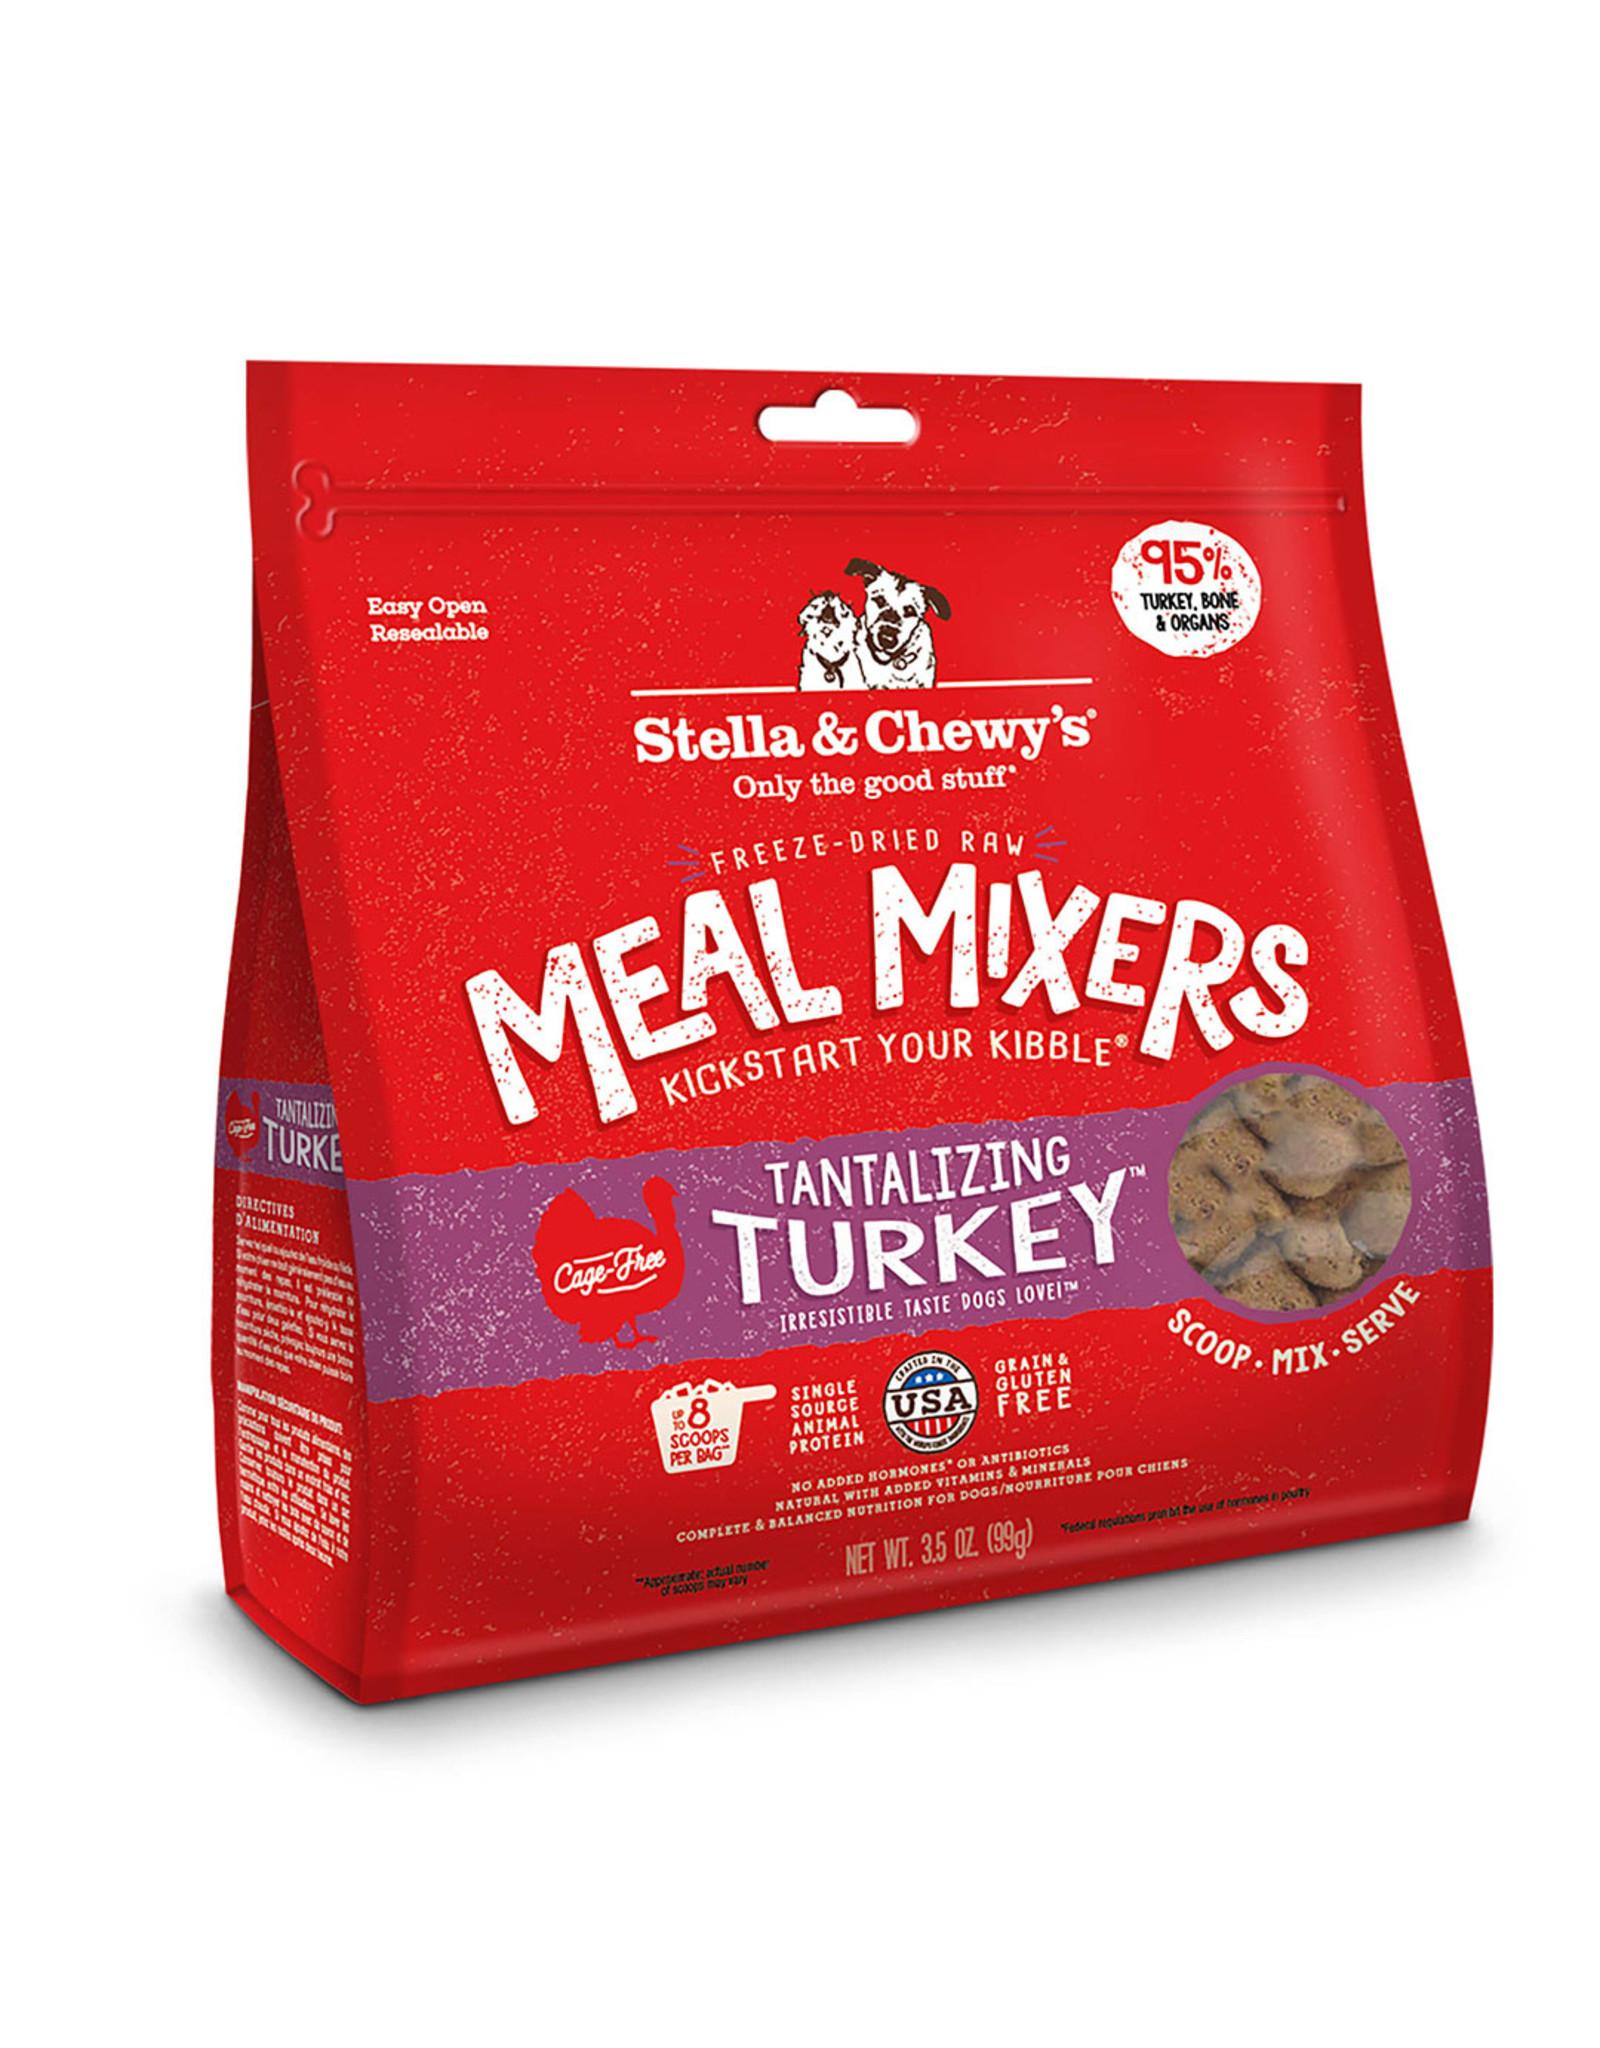 Stella & Chewy's Tantalizing Turkey Meal Mixers Freeze-Dried Raw Dog Food